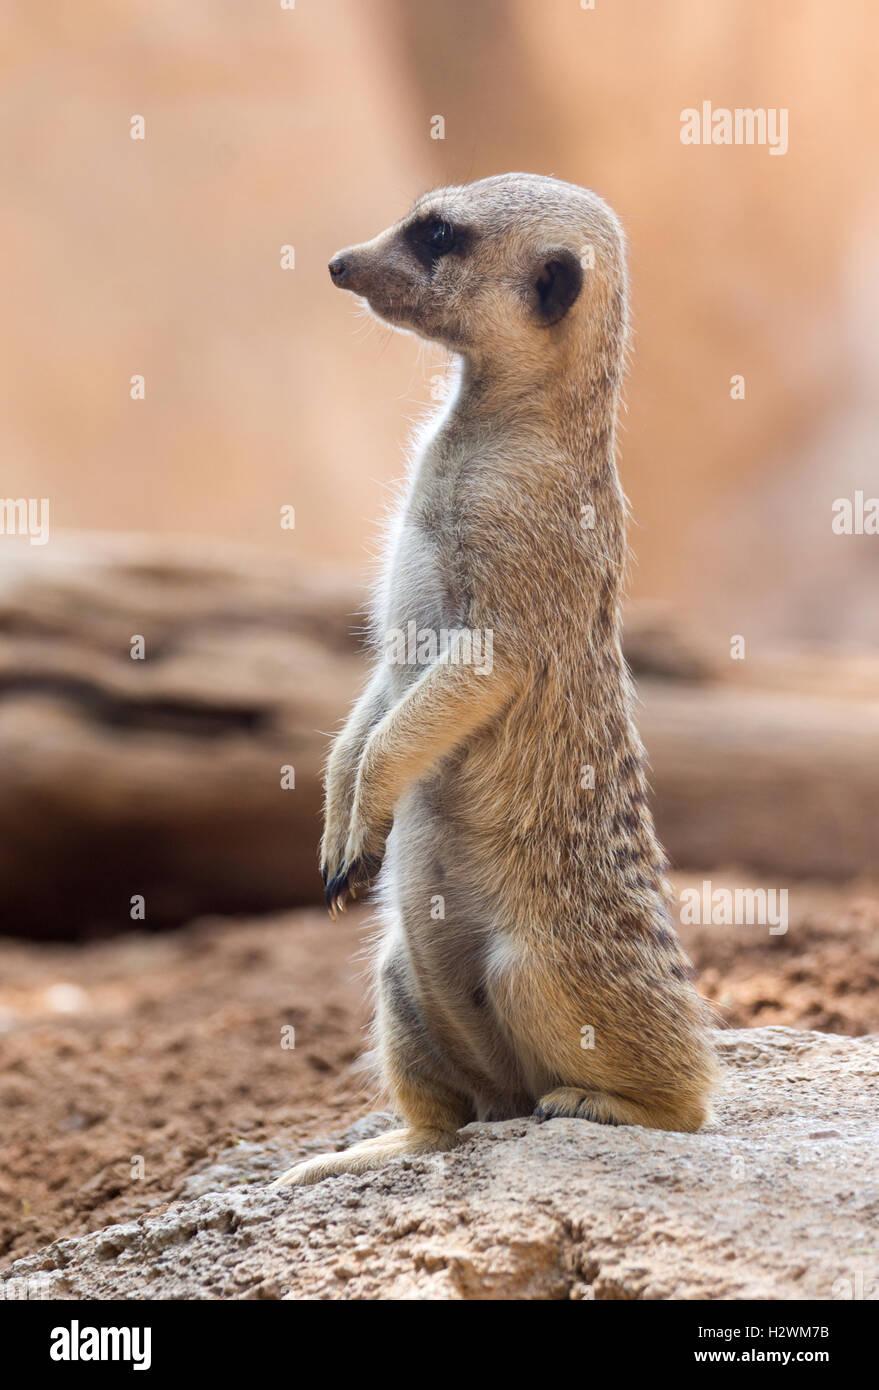 Un meerkat in piedi in posa tipica Immagini Stock